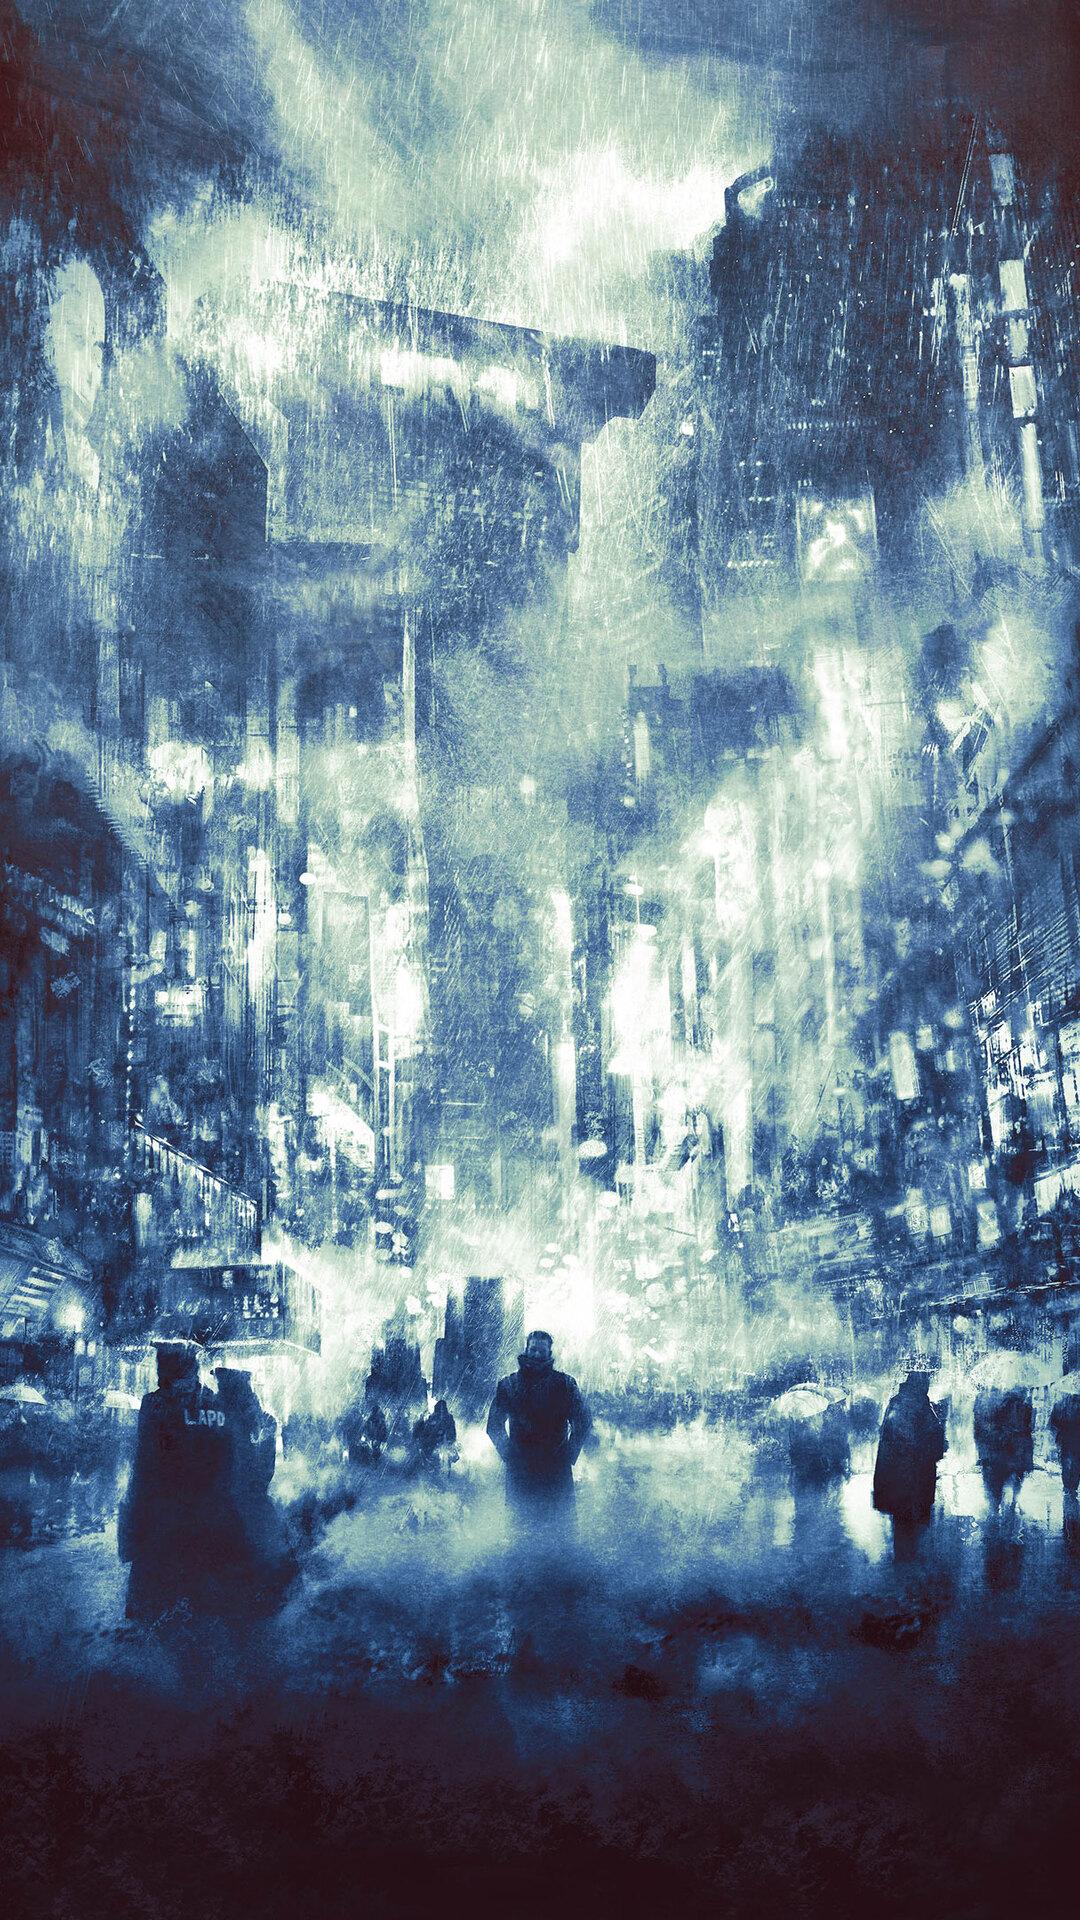 1080x1920 Blade Runner 2049 Art Iphone 7 6s 6 Plus Pixel Xl One